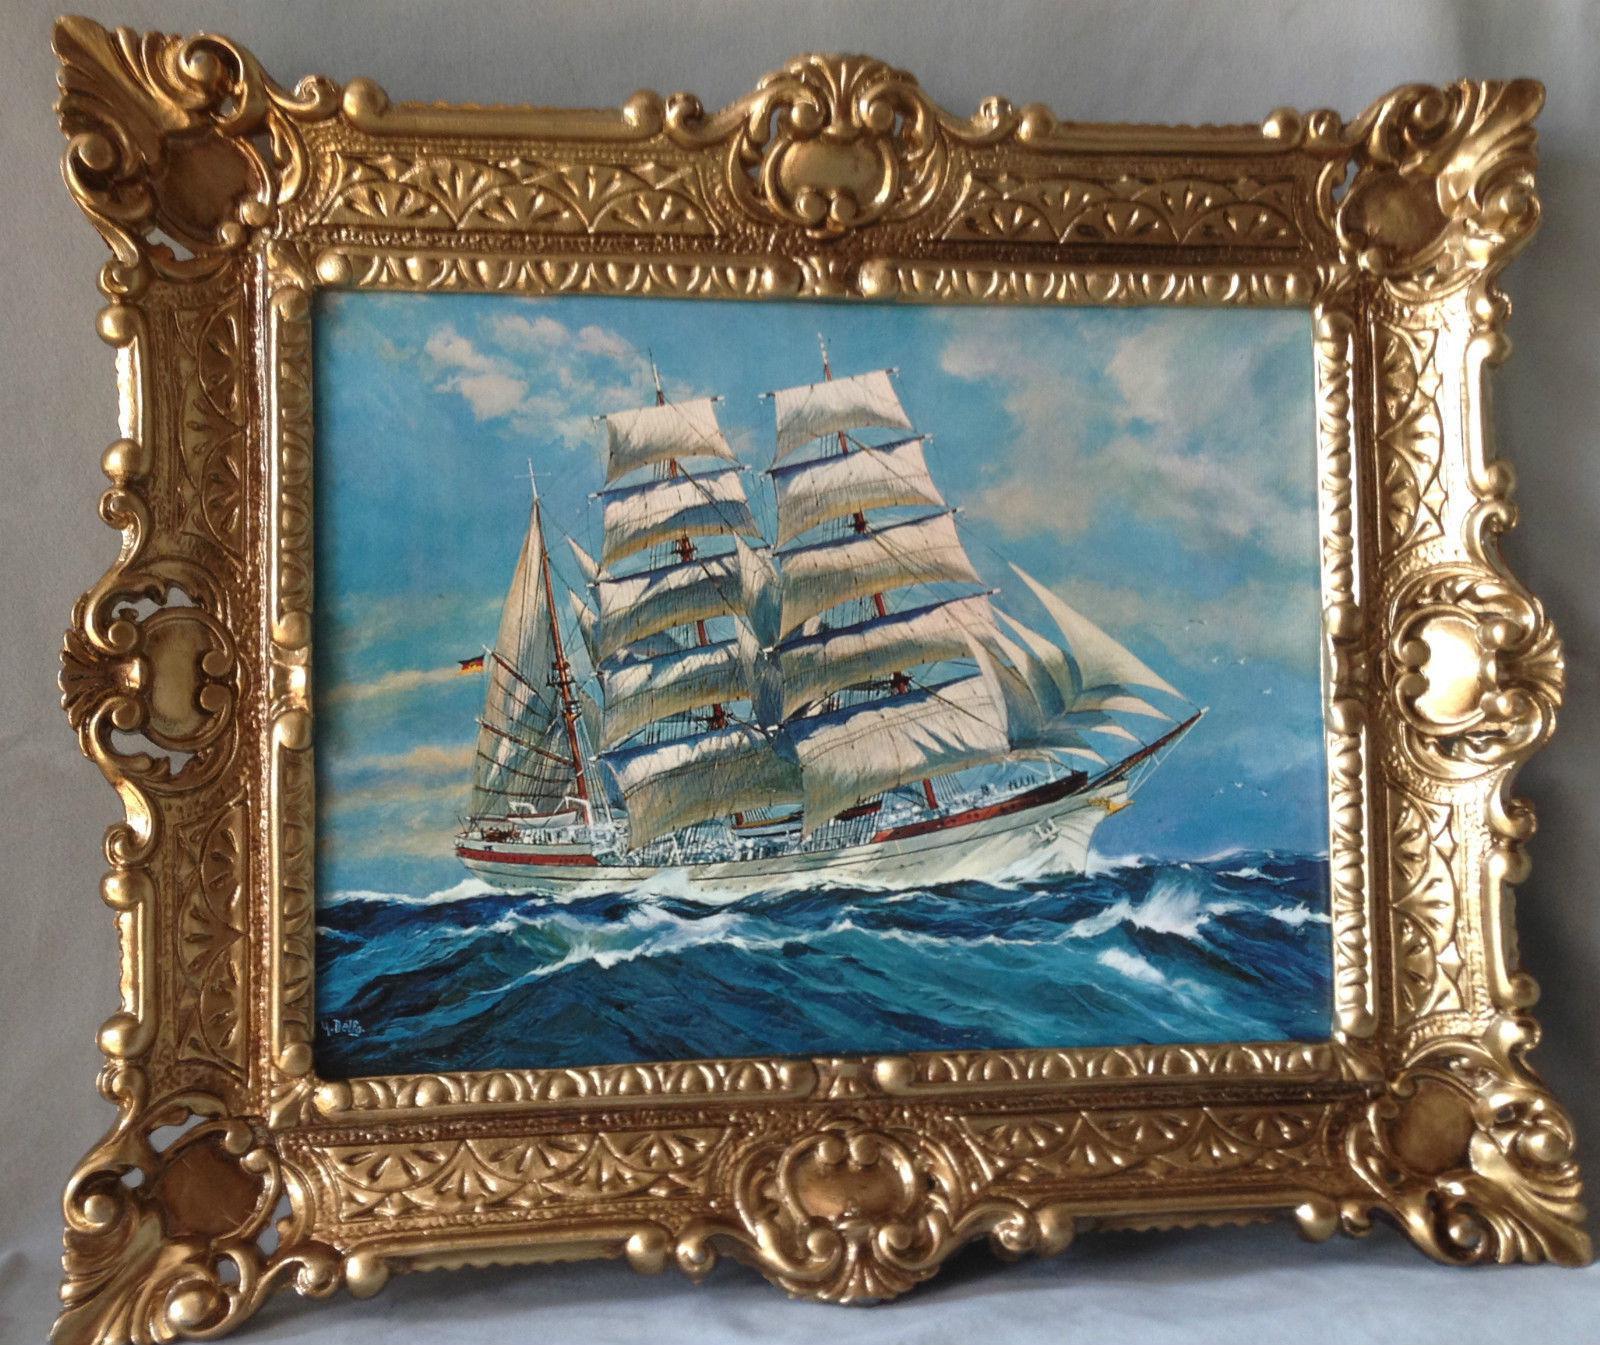 segelschiff meer maritime gem lde schiffe bilderrrahmen wandbild antik 56x46 w kaufen bei. Black Bedroom Furniture Sets. Home Design Ideas